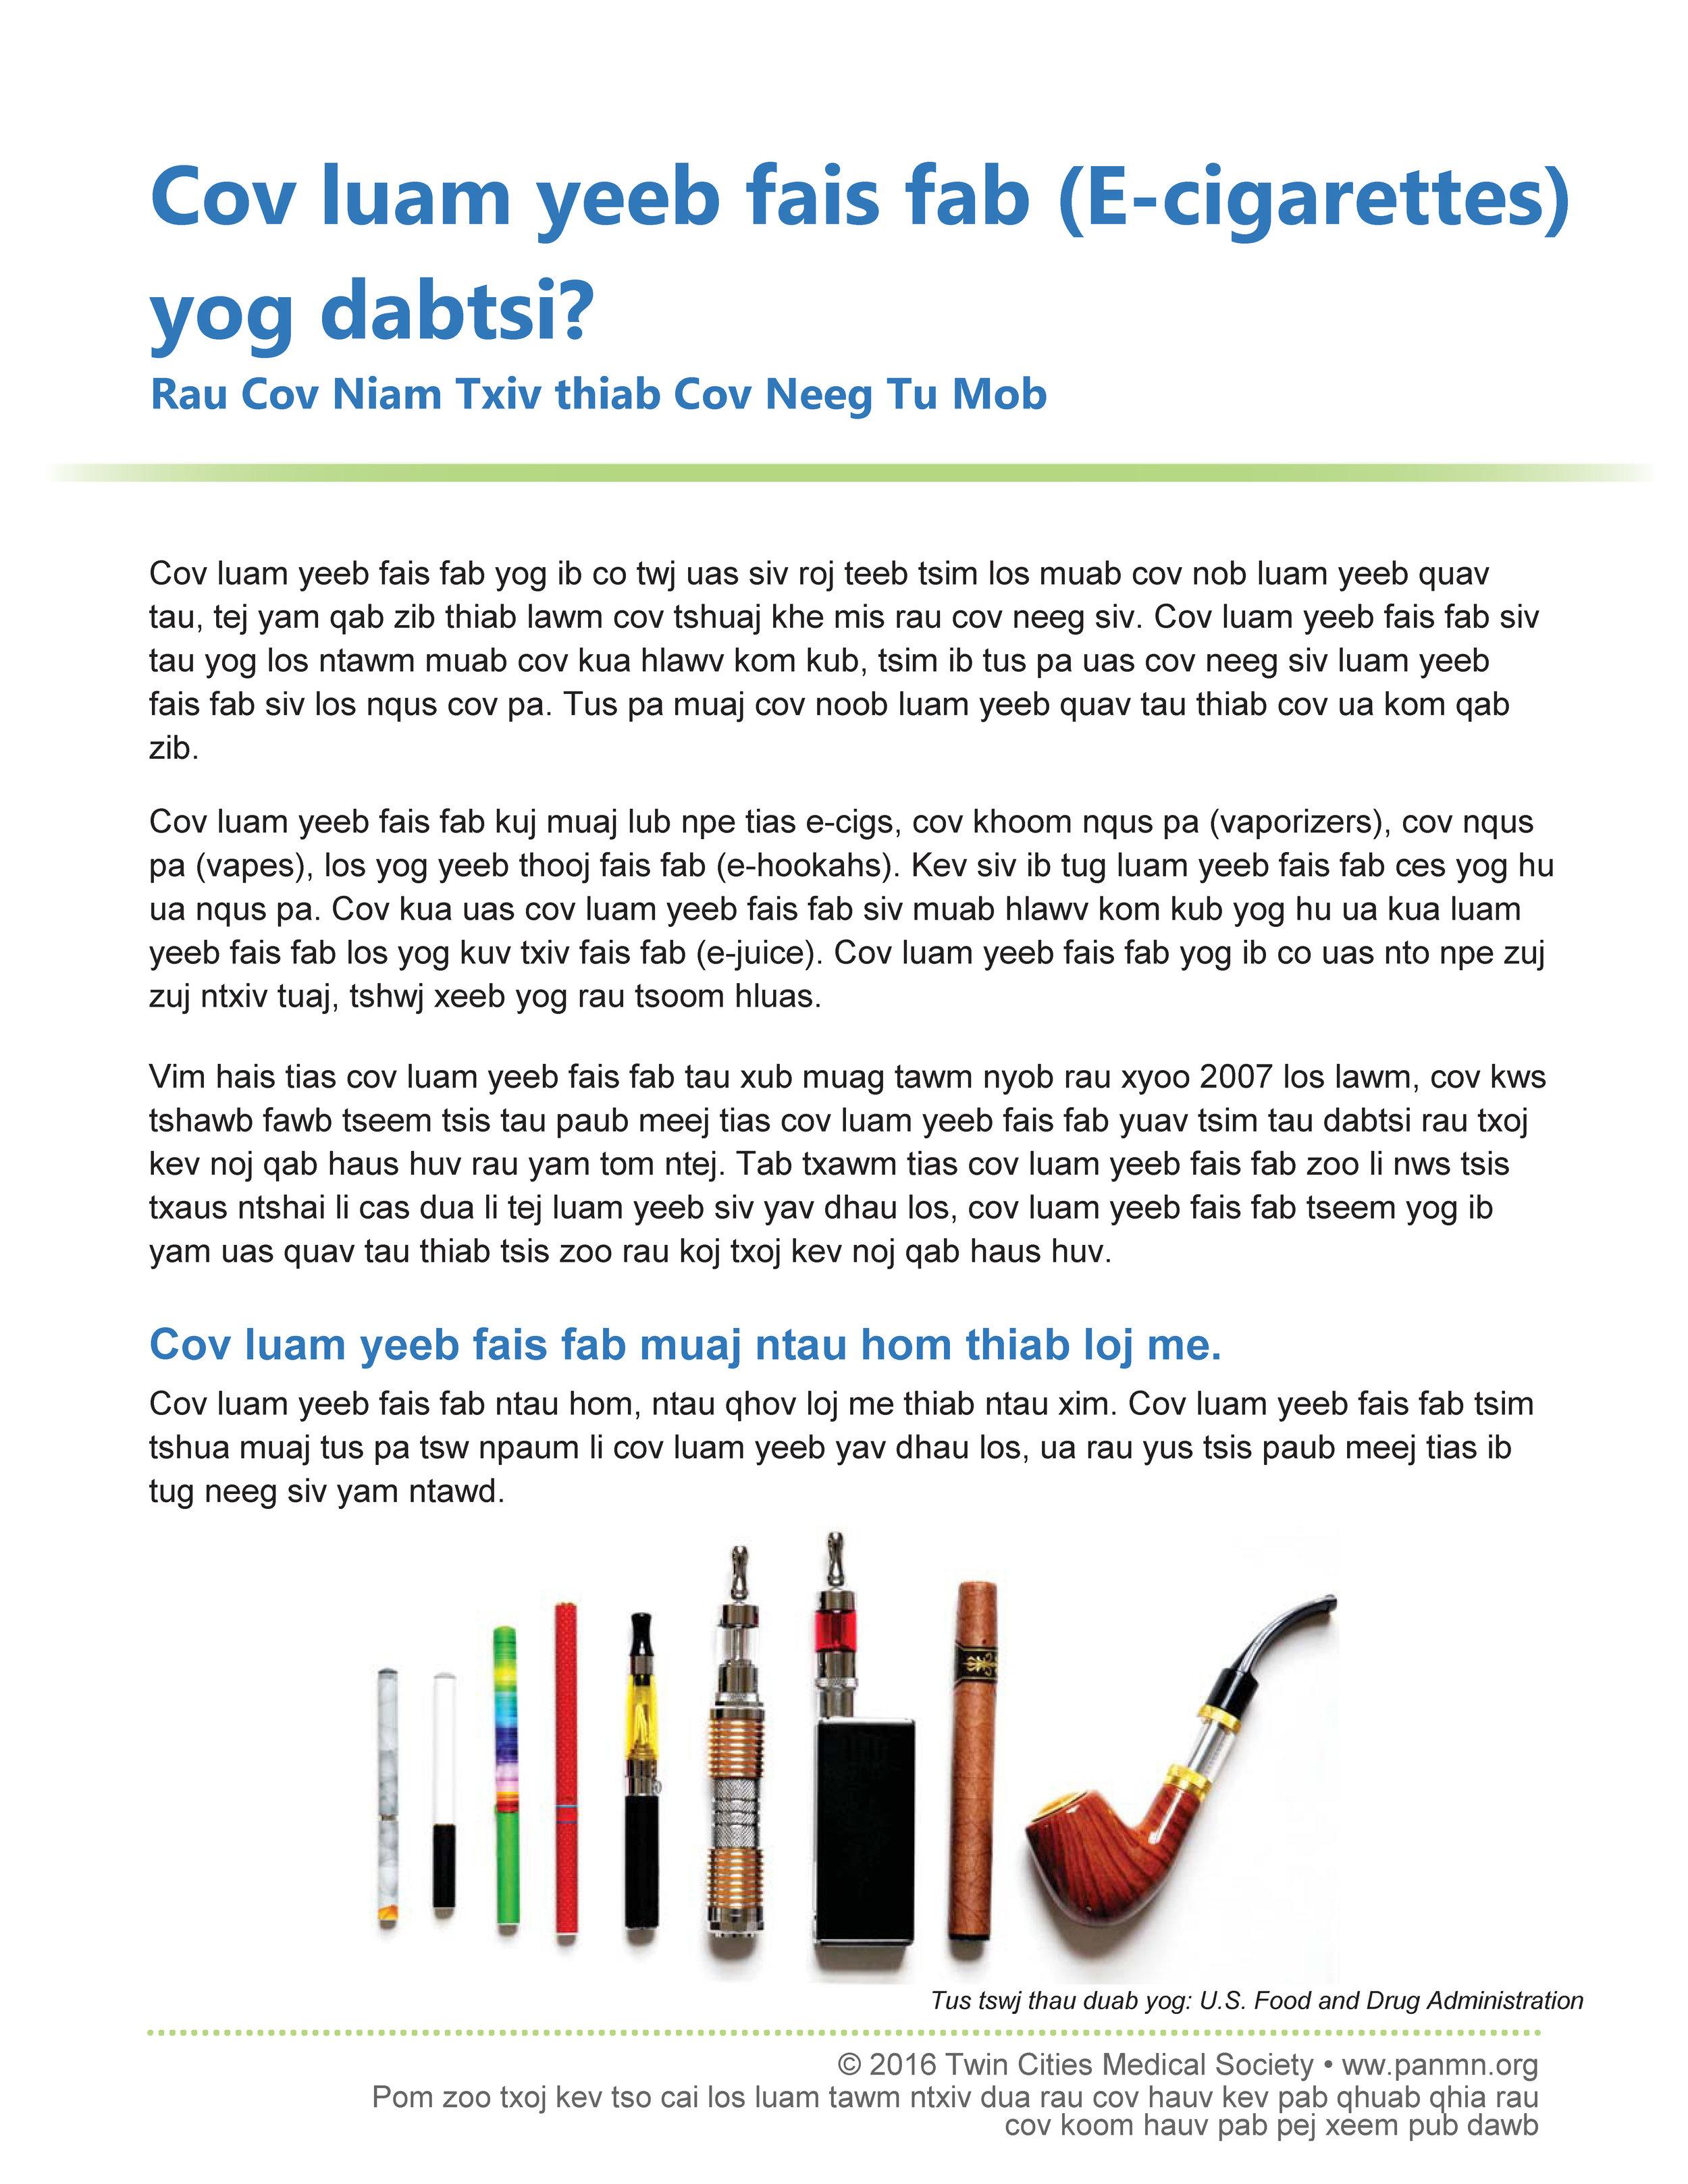 What are E-Cigarettes - Hmong